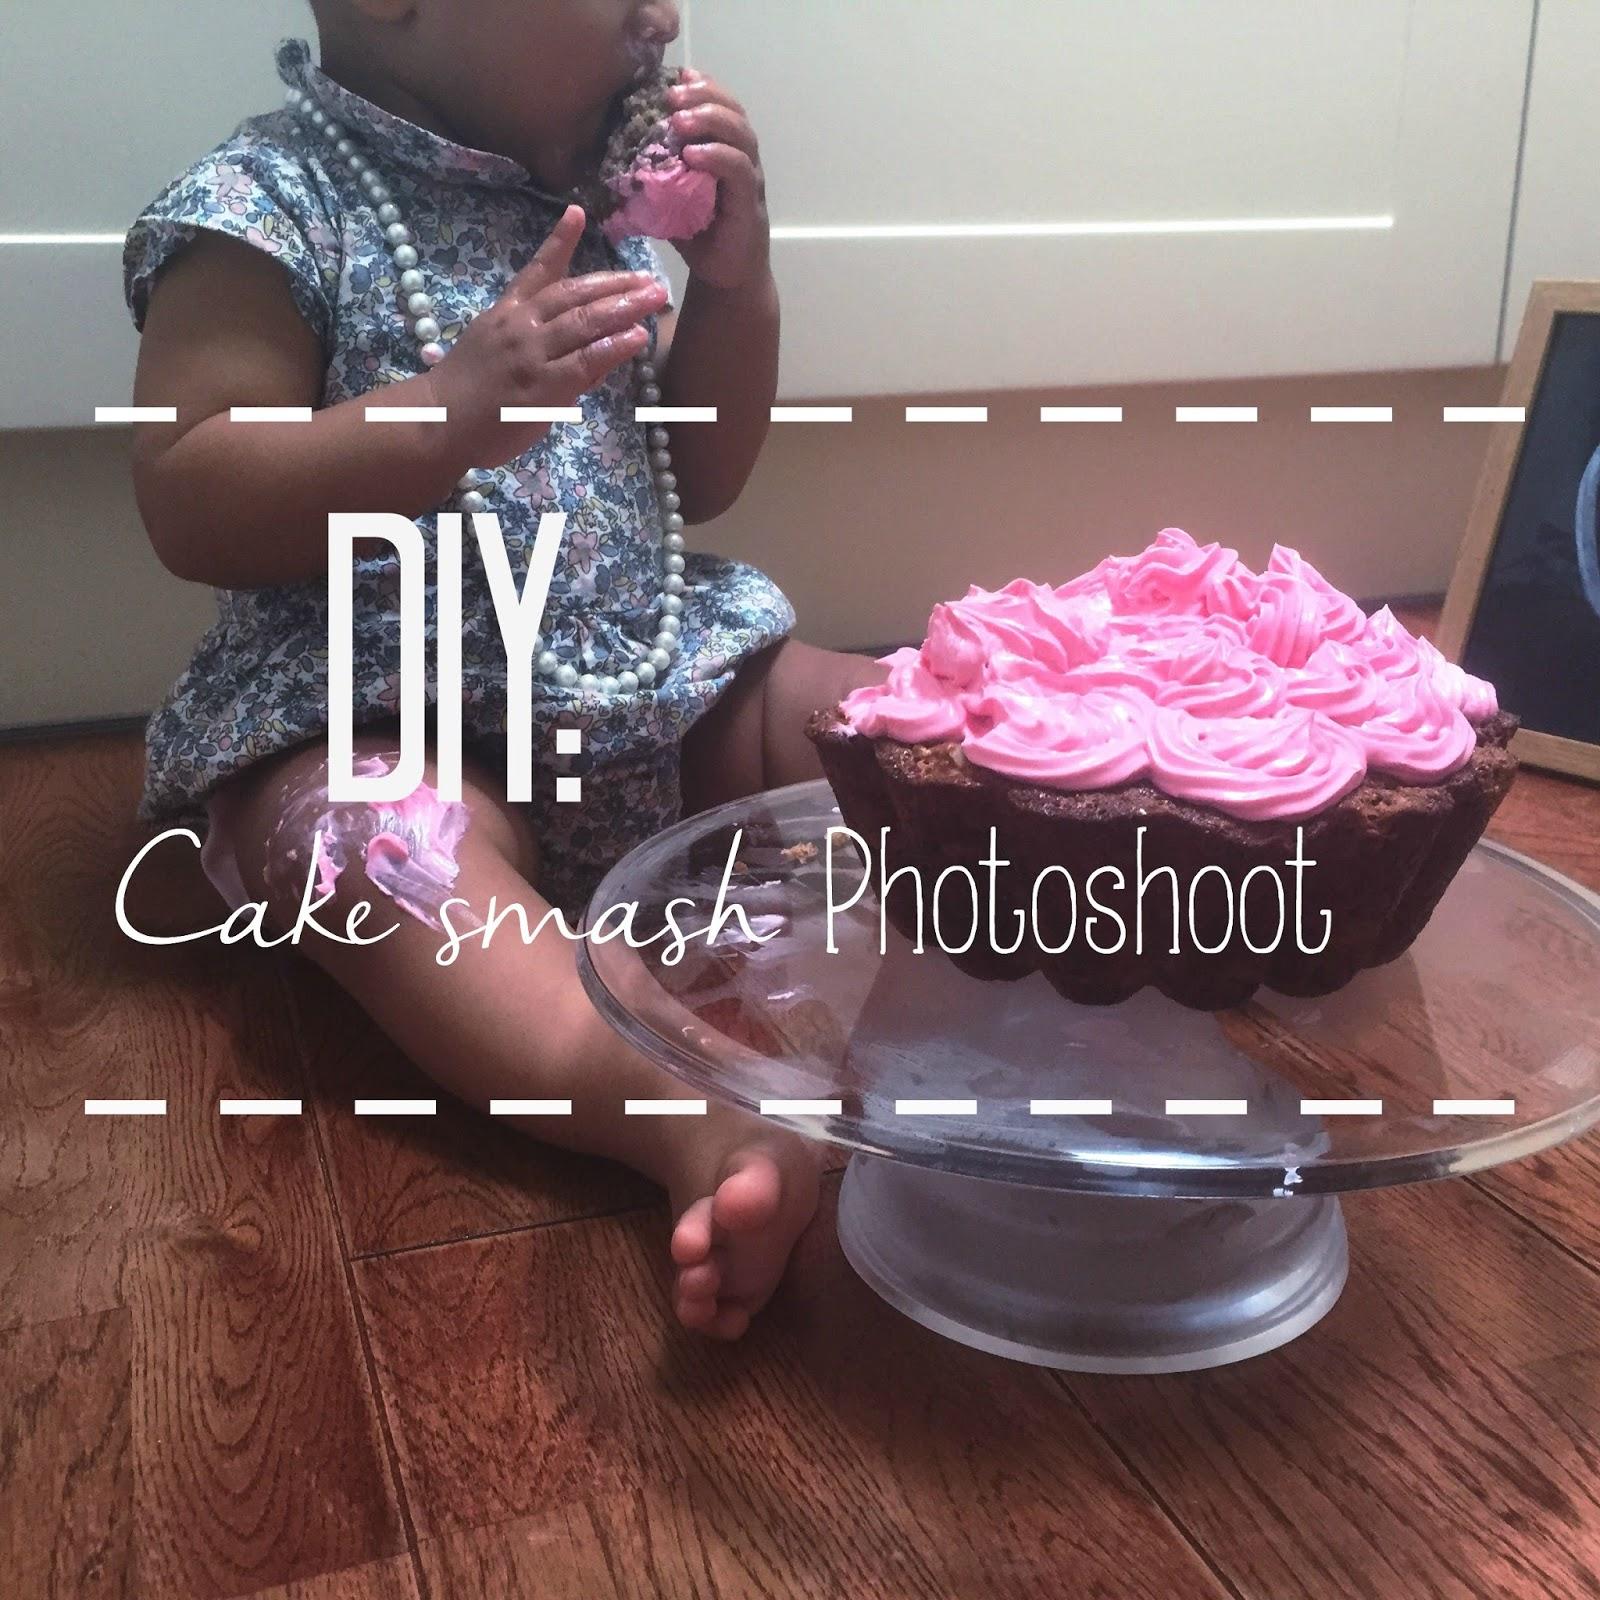 Diy First Birthday Cake Smash Photo Shoot